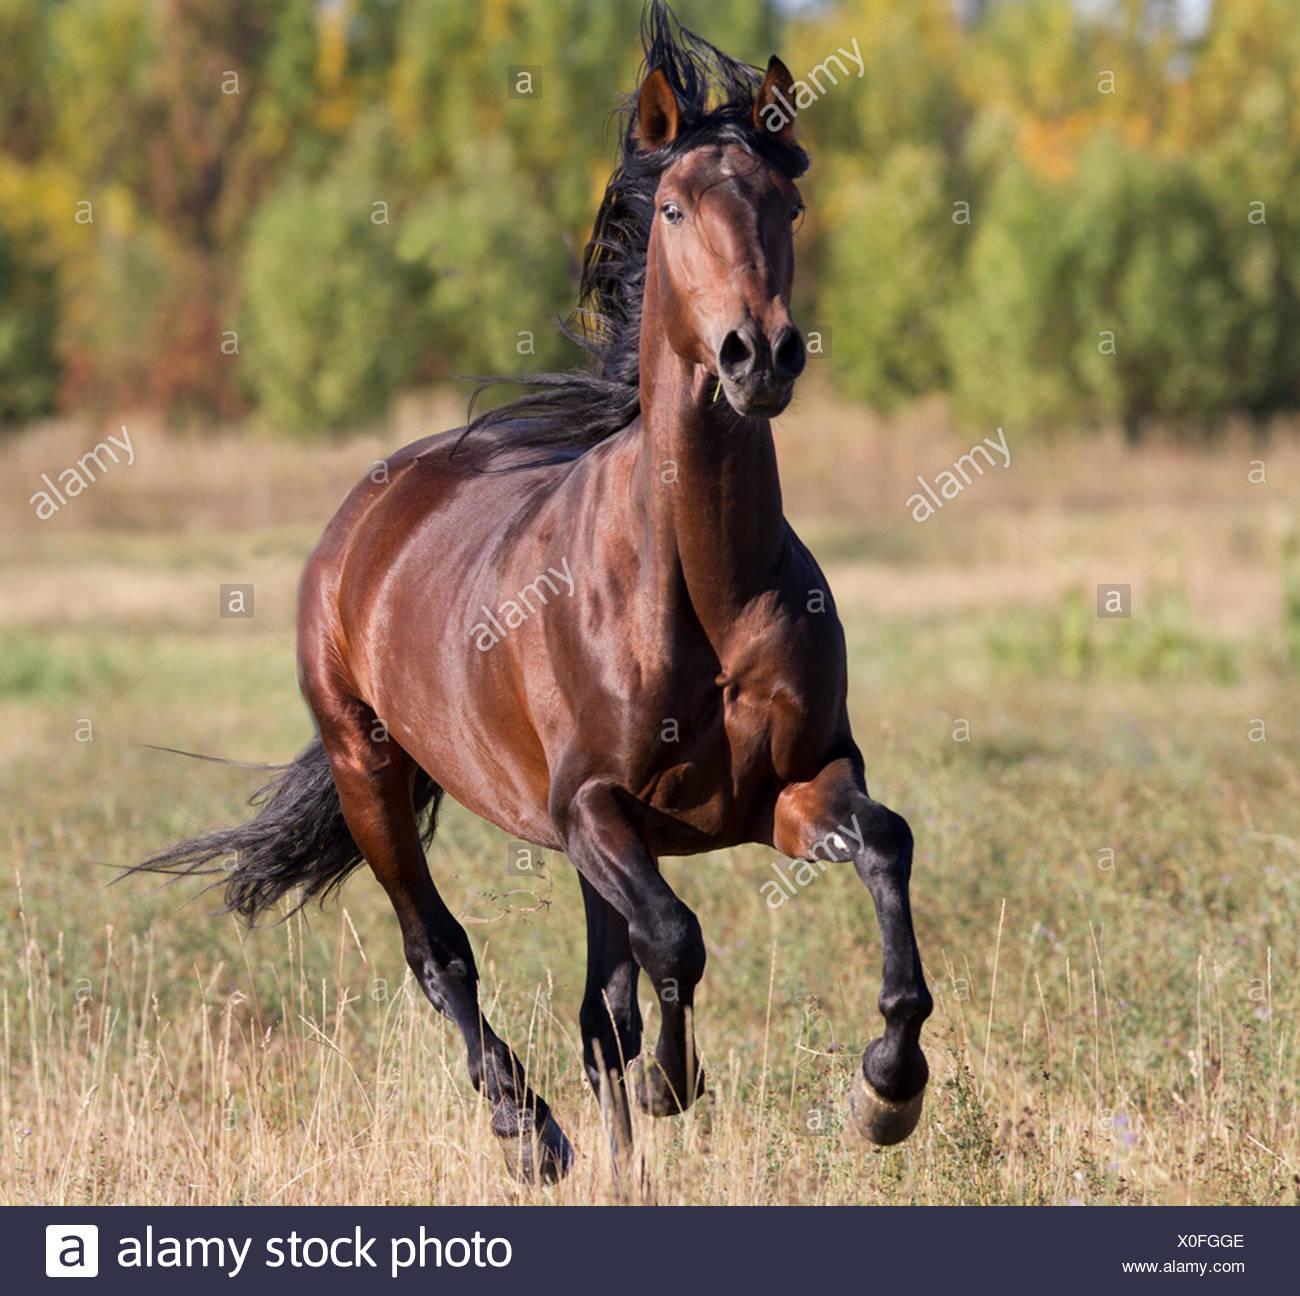 Andalusian stallion running, Longmont, Colorado, USA. - Stock Image